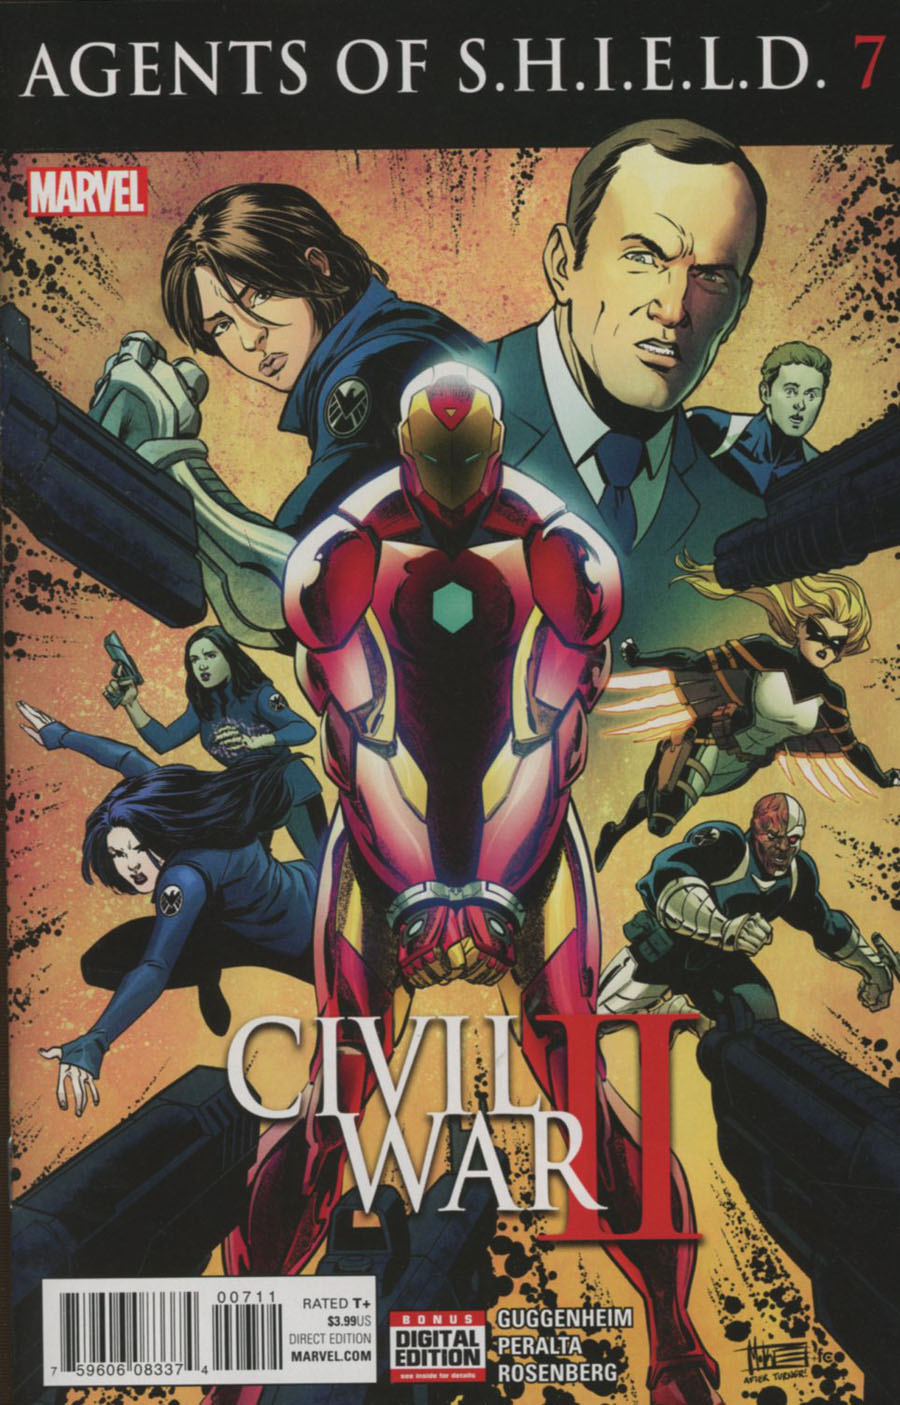 Agents Of S.H.I.E.L.D. #7 (Civil War II Tie-In)